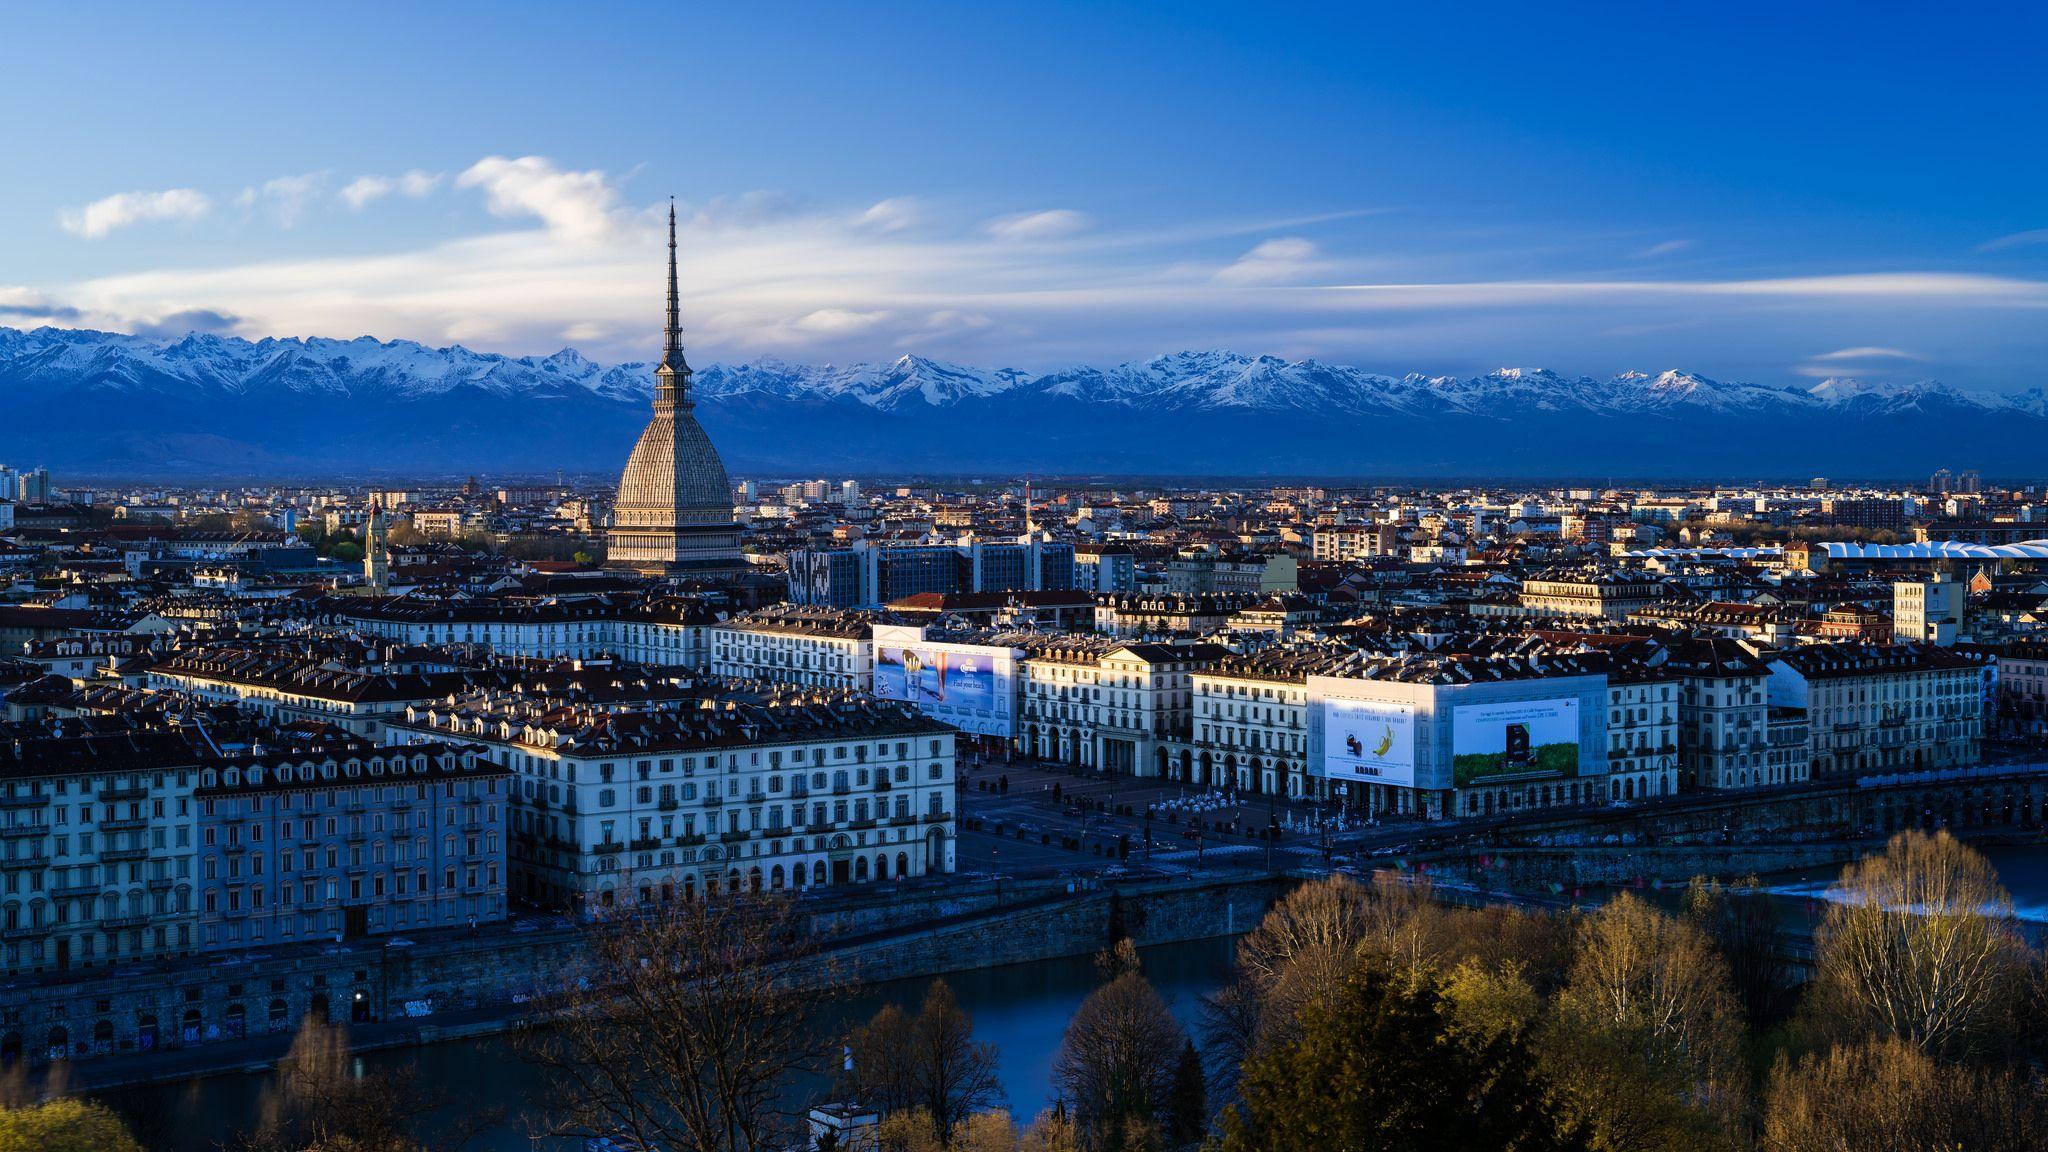 https://flic.kr/p/skwVUa | Turin | Piedmont